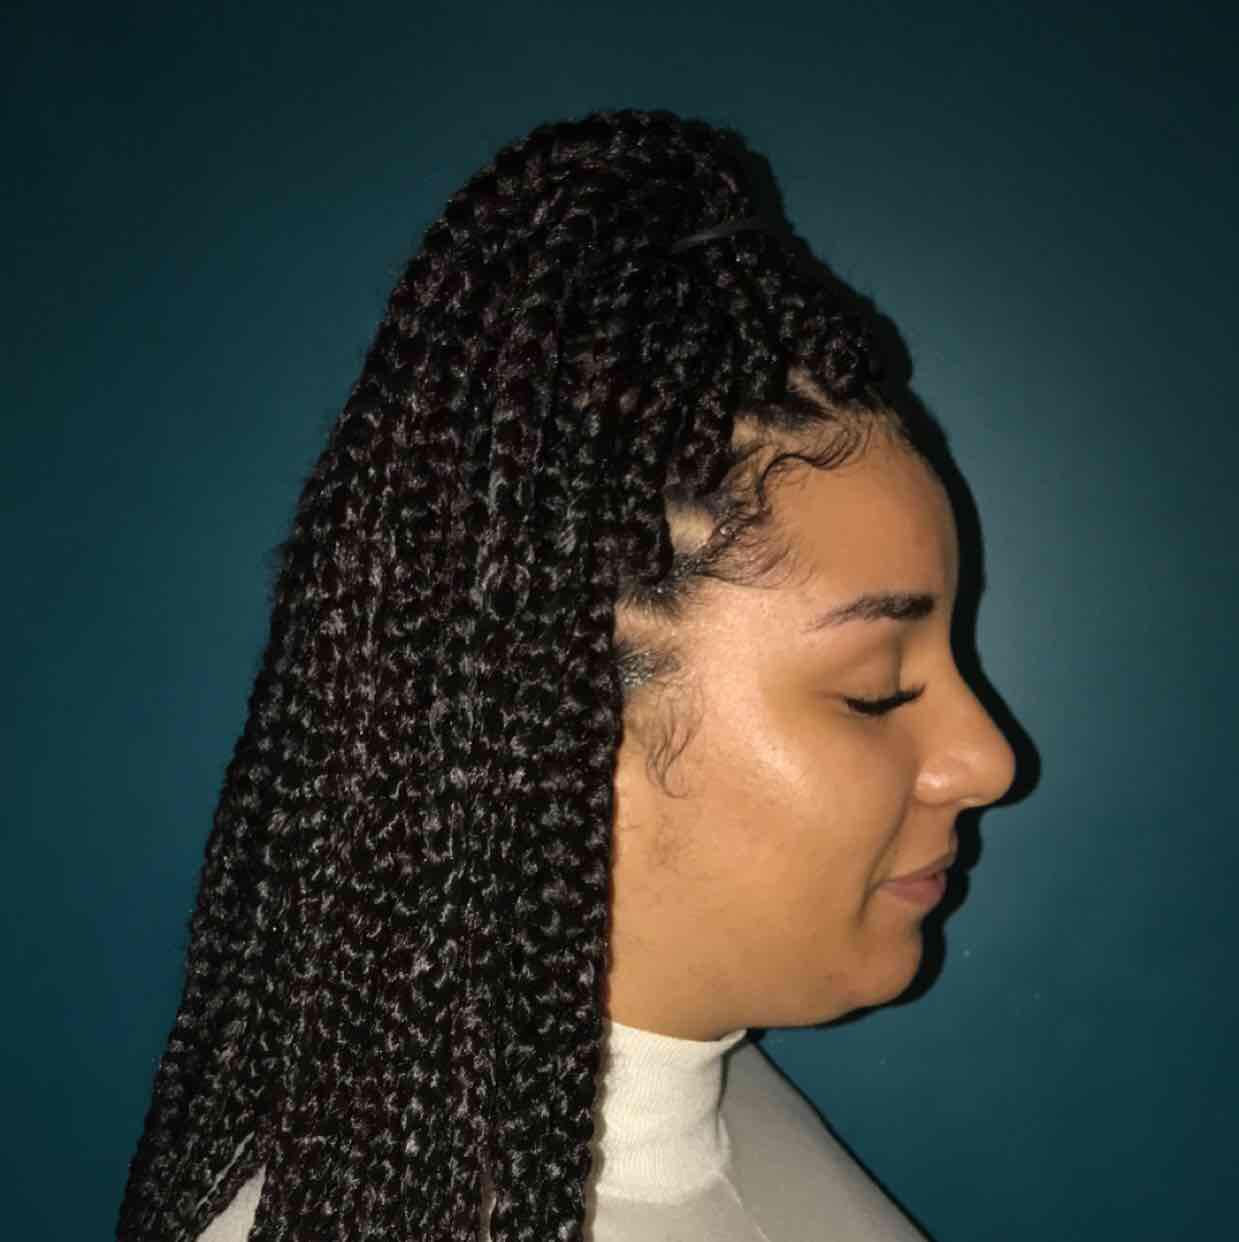 salon de coiffure afro tresse tresses box braids crochet braids vanilles tissages paris 75 77 78 91 92 93 94 95 RQWLBDIU